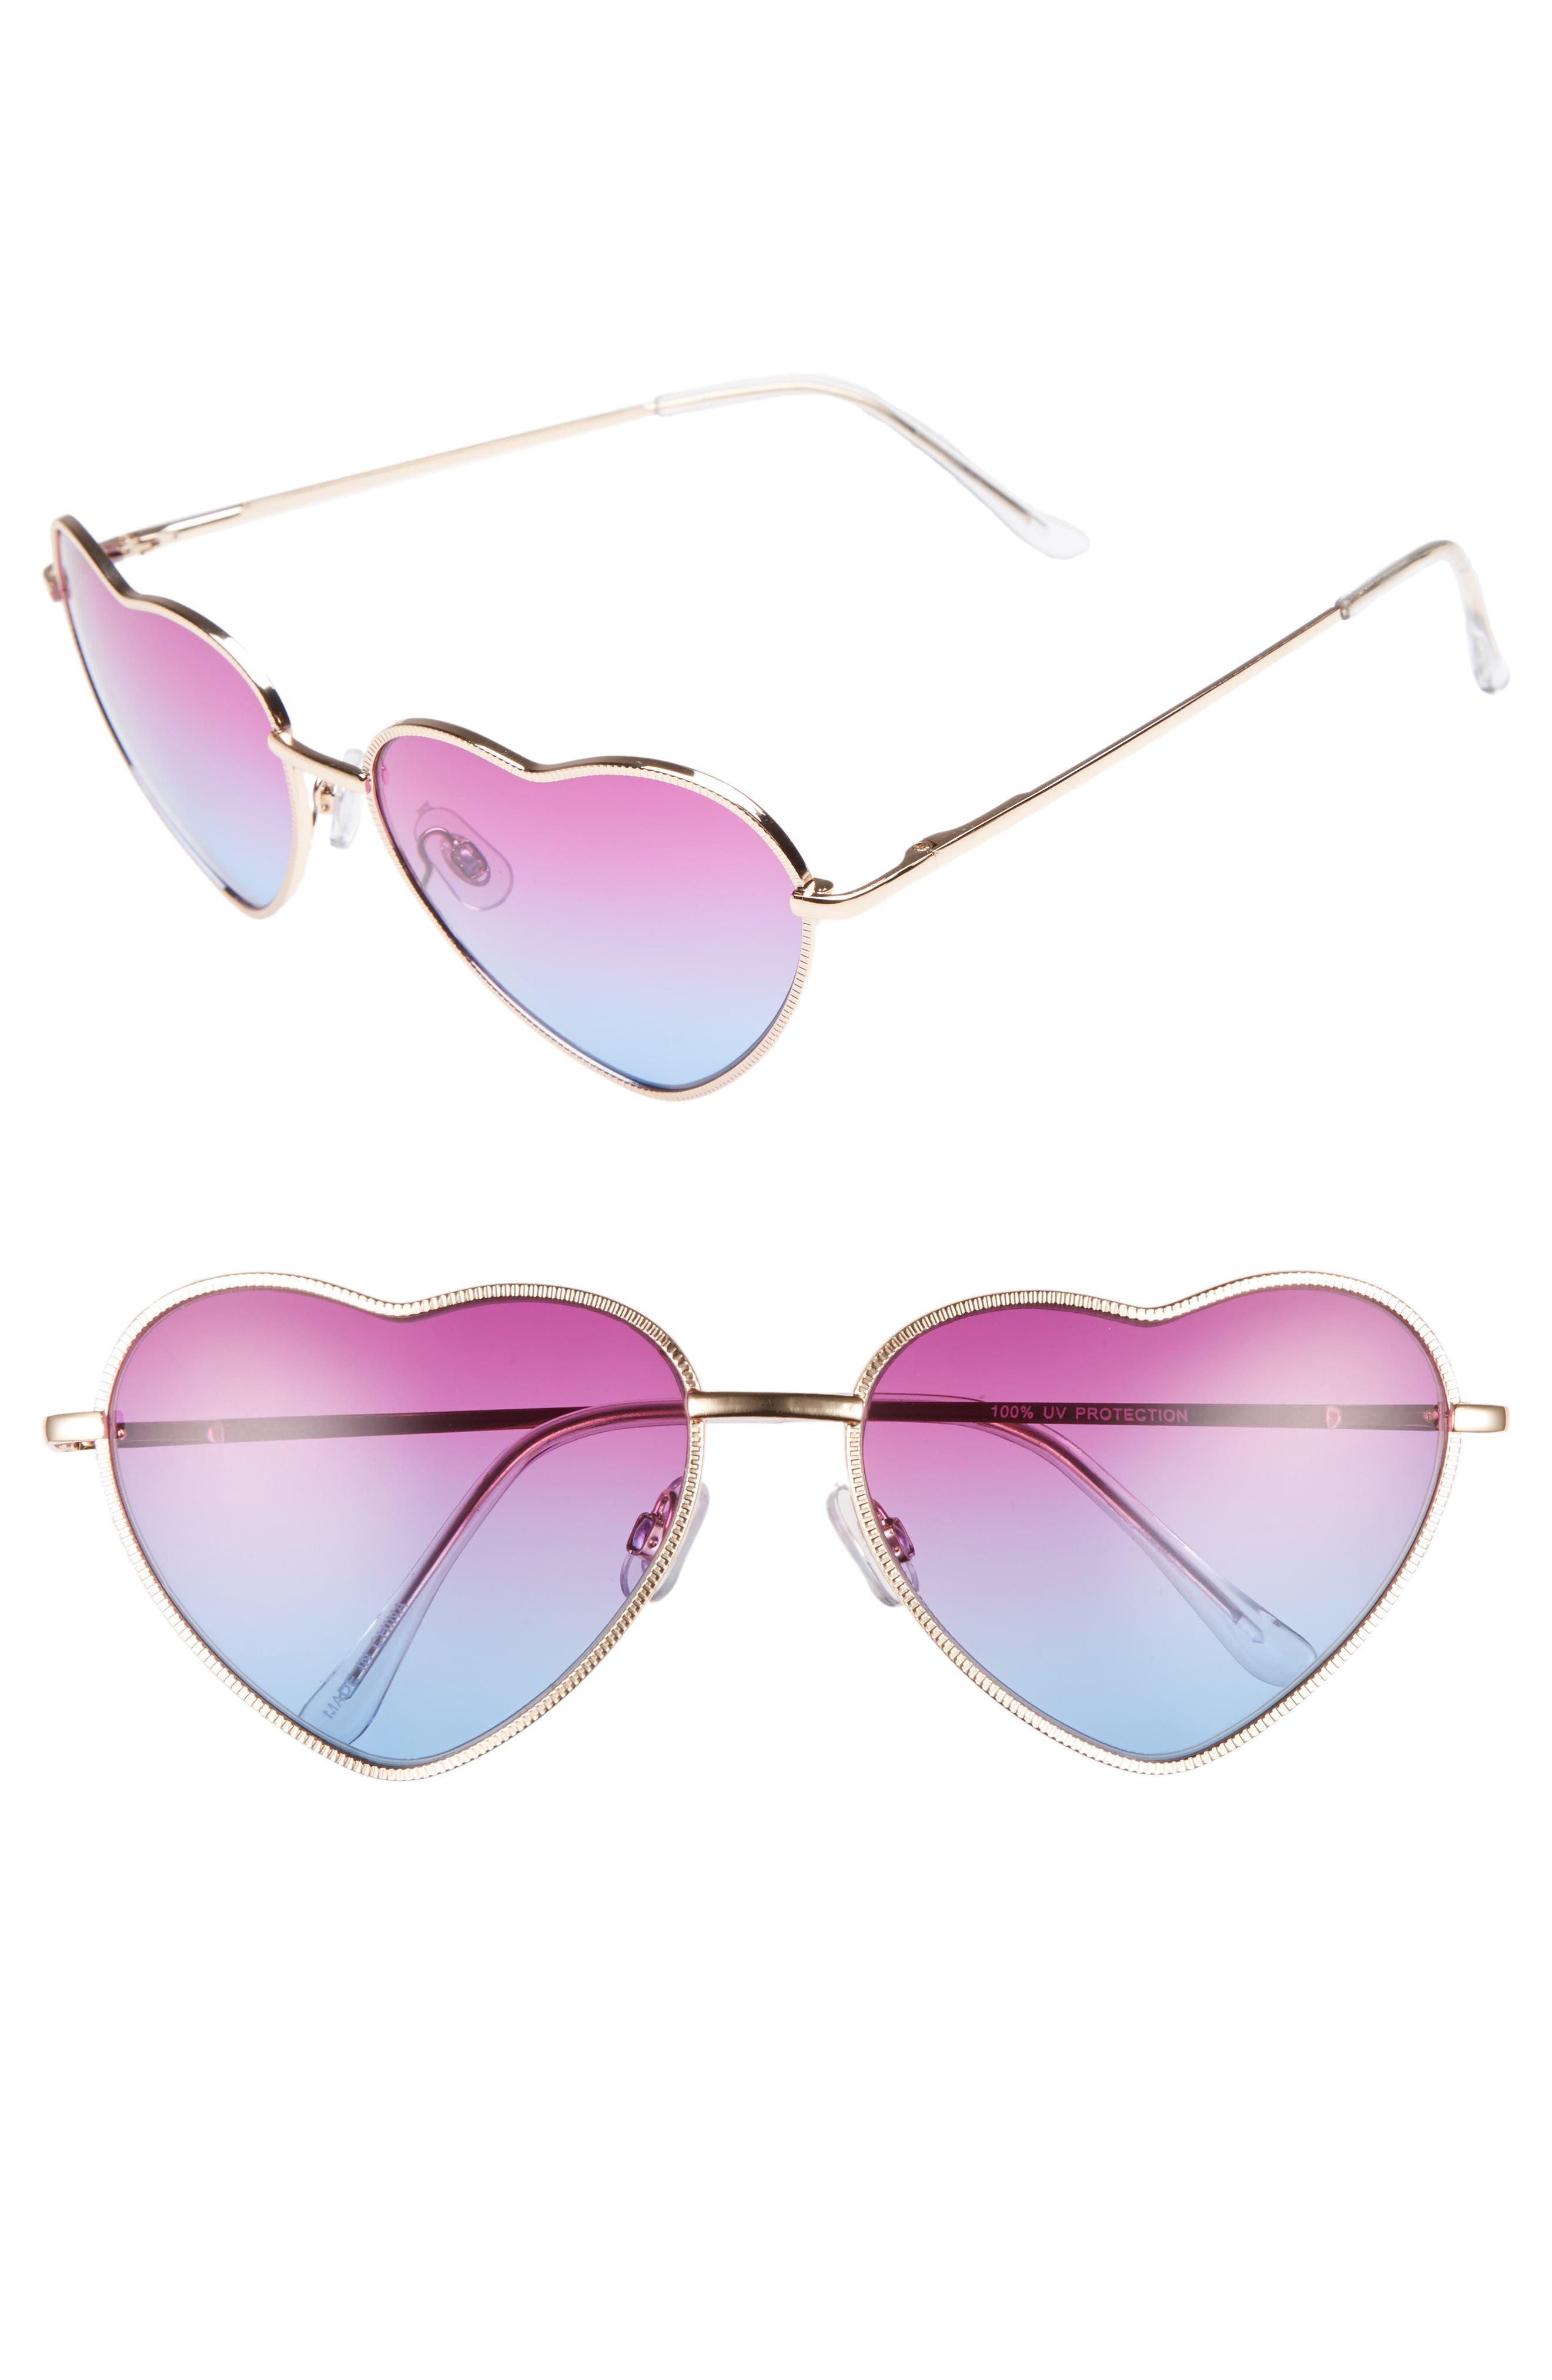 Alternate Image 1 Selected - BP. Heart Shaped 58mm Sunglasses